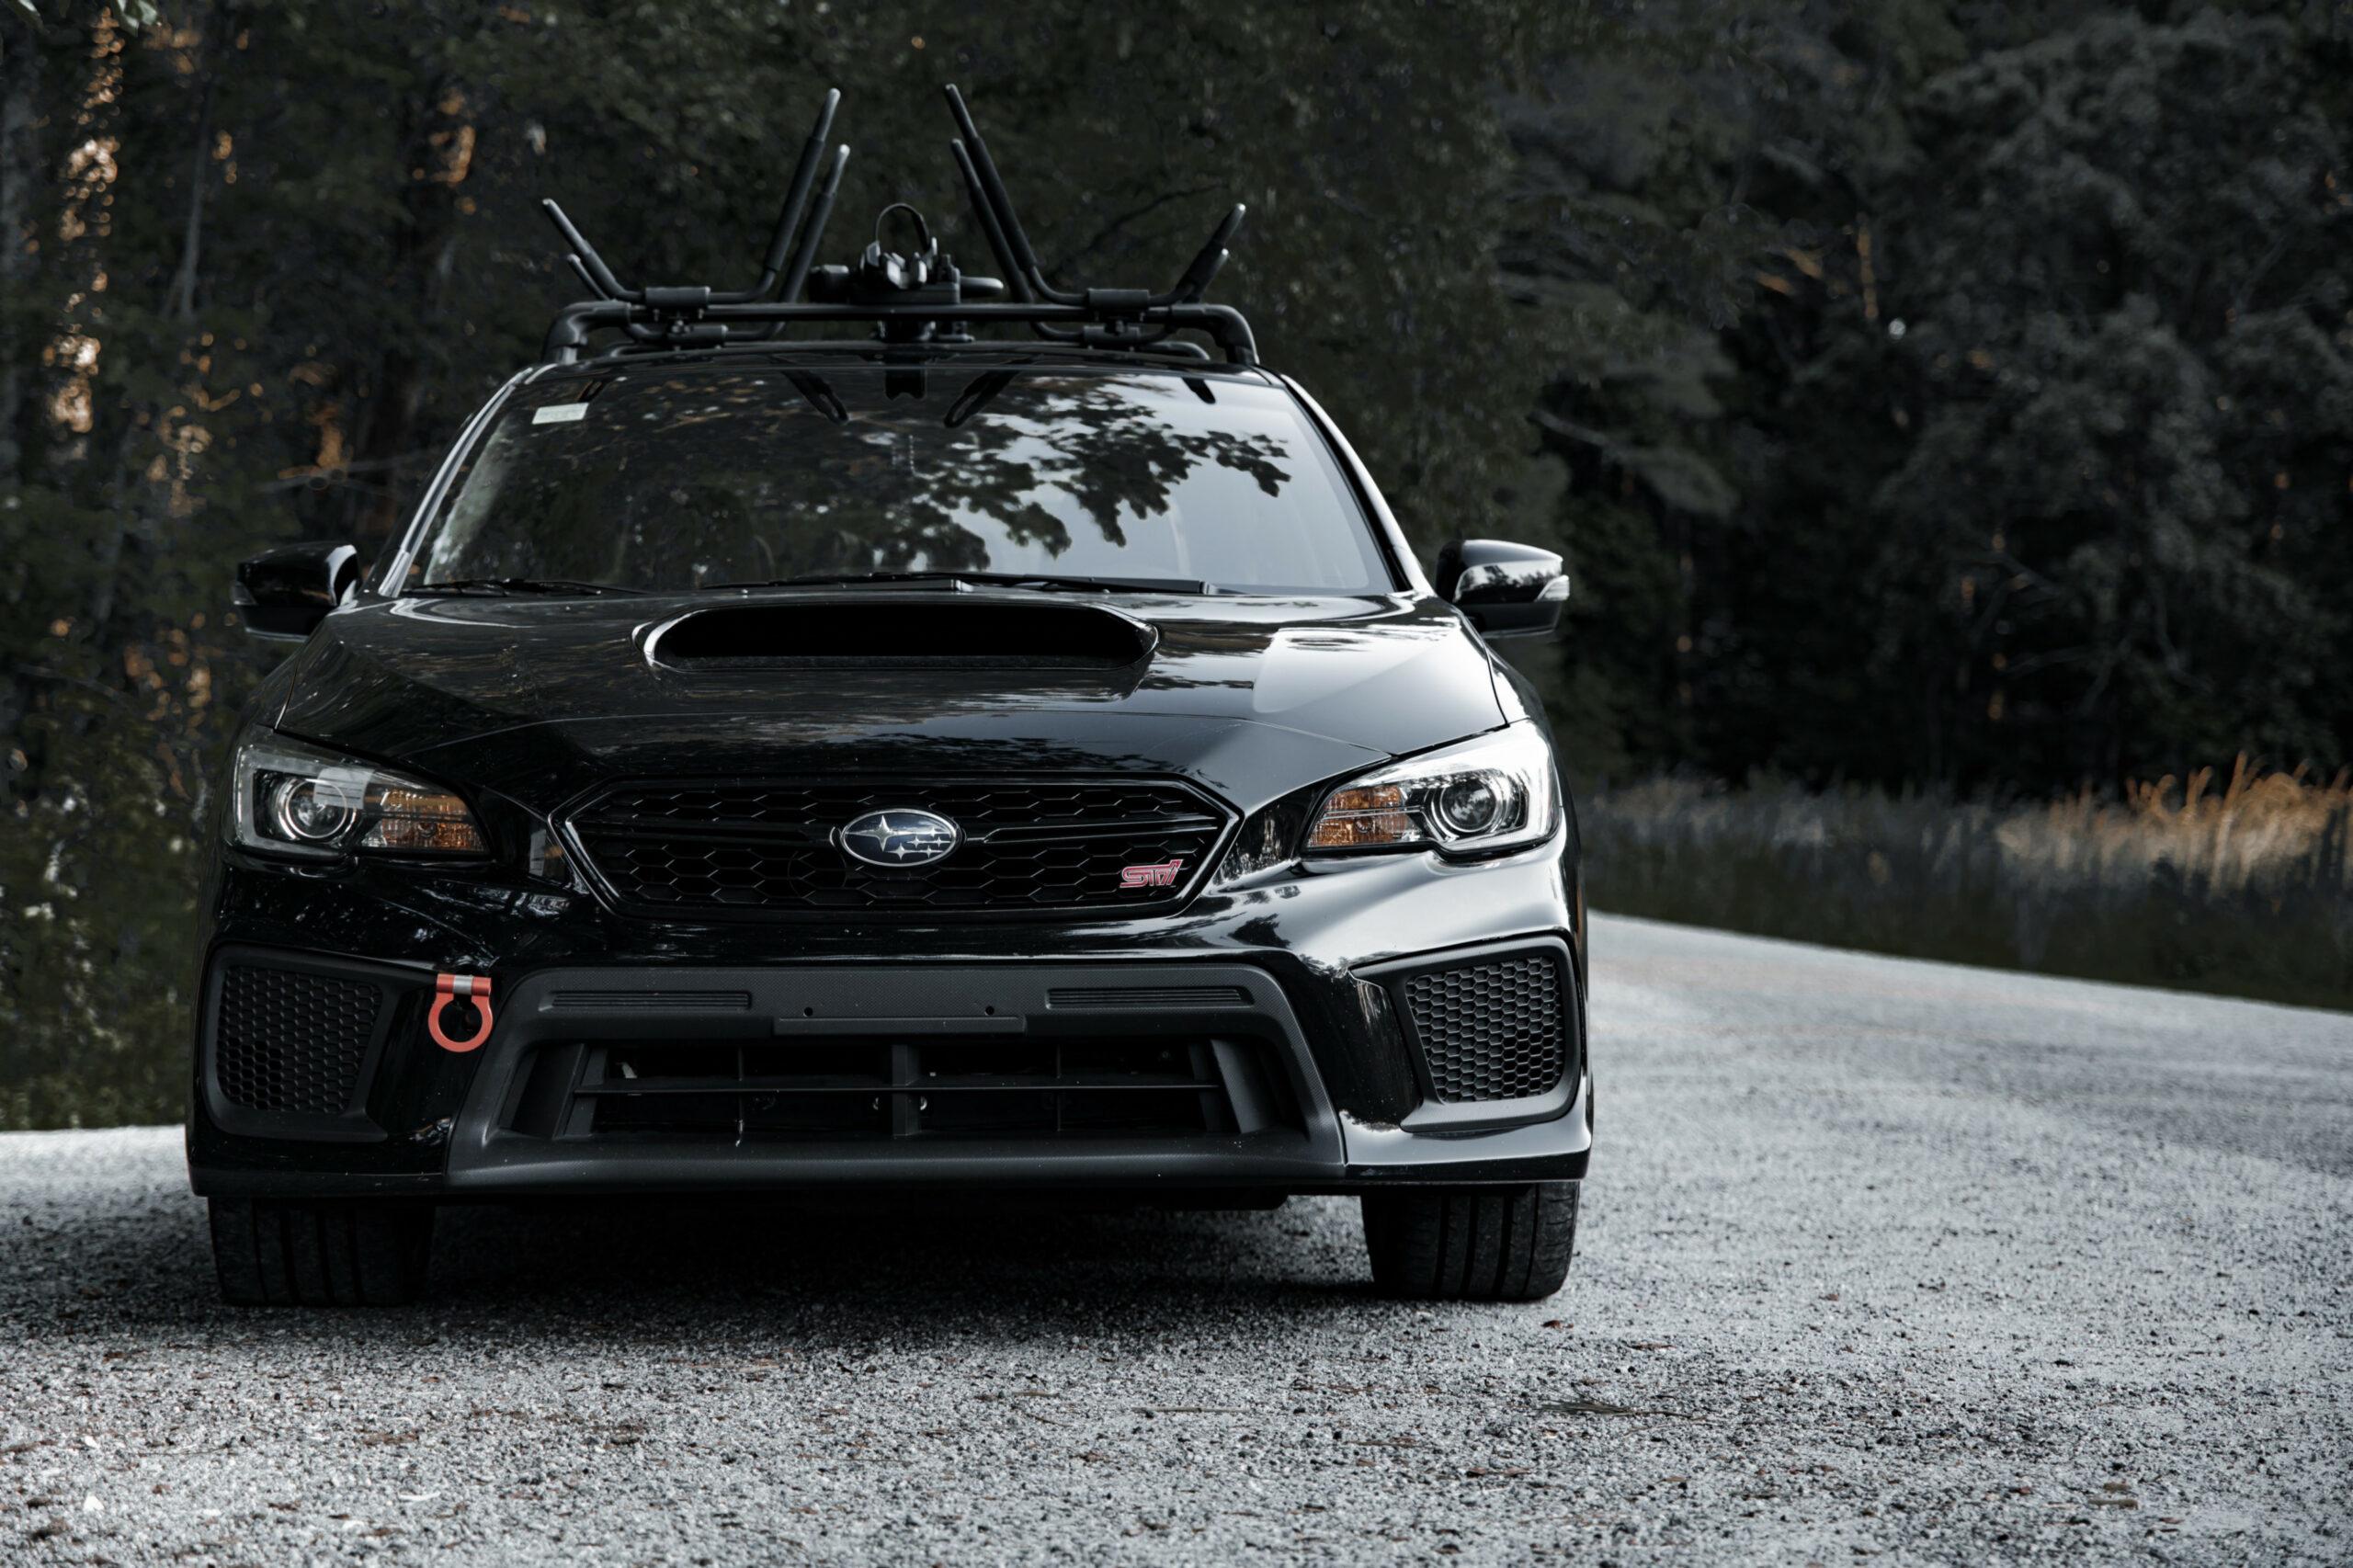 Pictures Subaru Wrx Hatchback 2022